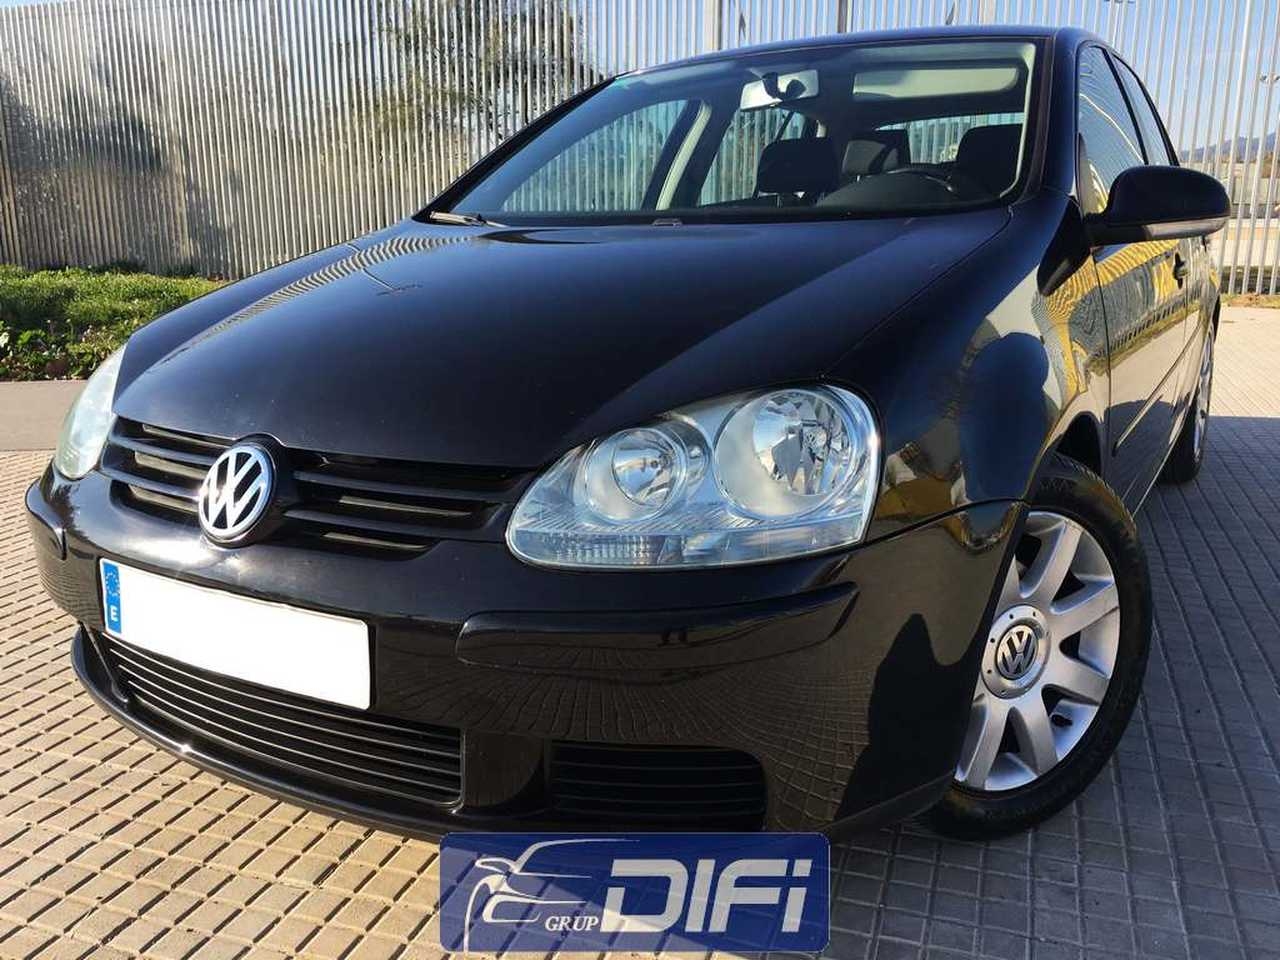 Volkswagen Golf Golf 1.6 5p 105cv   - Foto 1